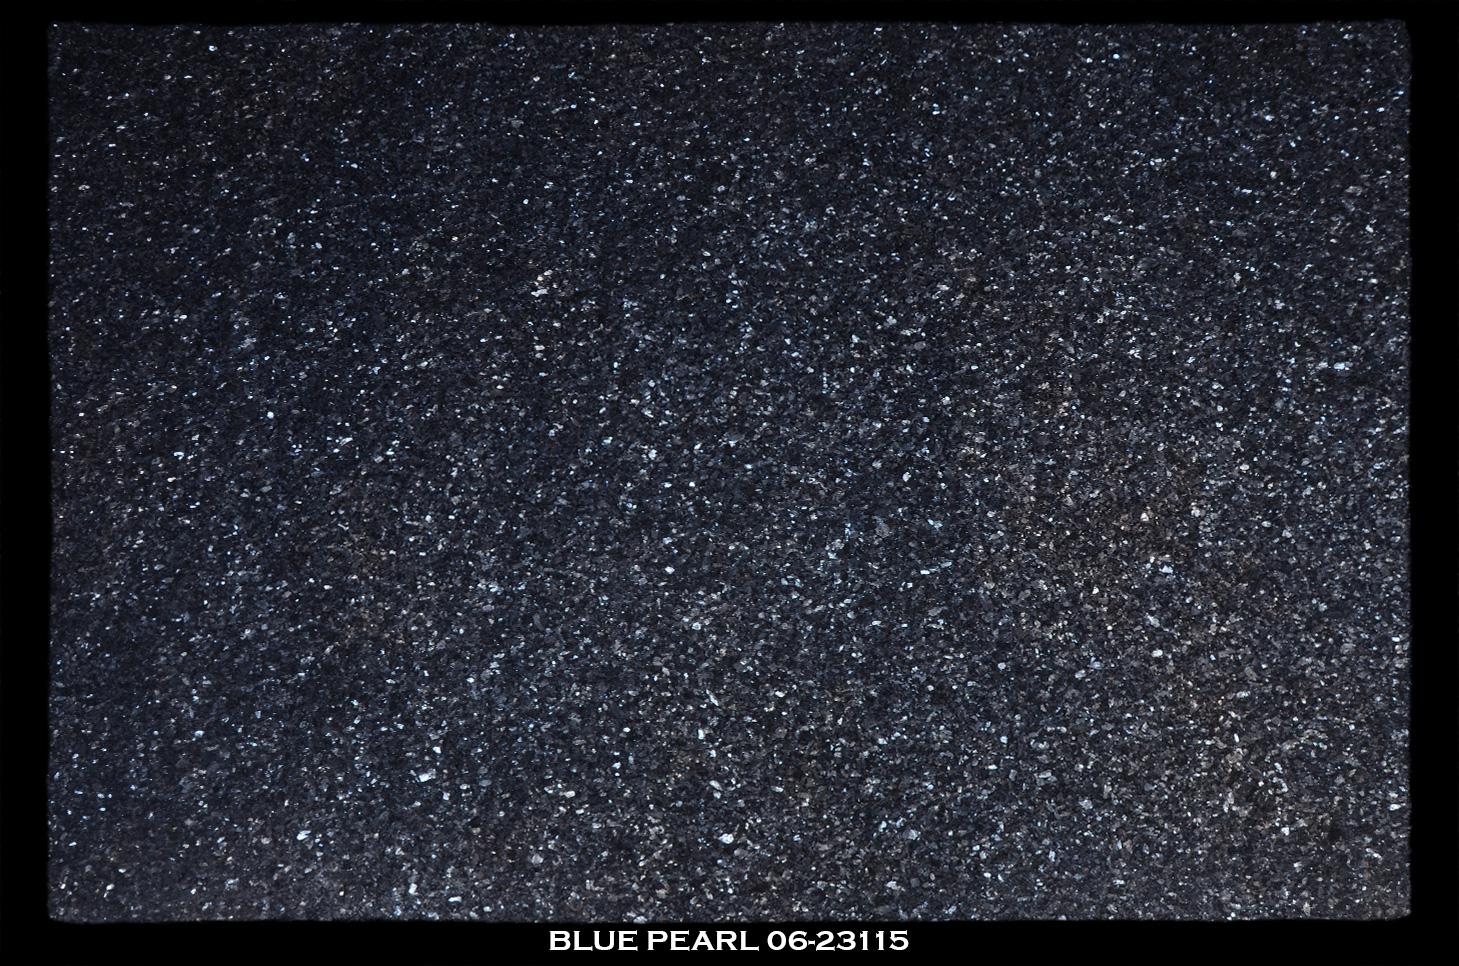 BLUE-PEARL-06-23115-SLAB